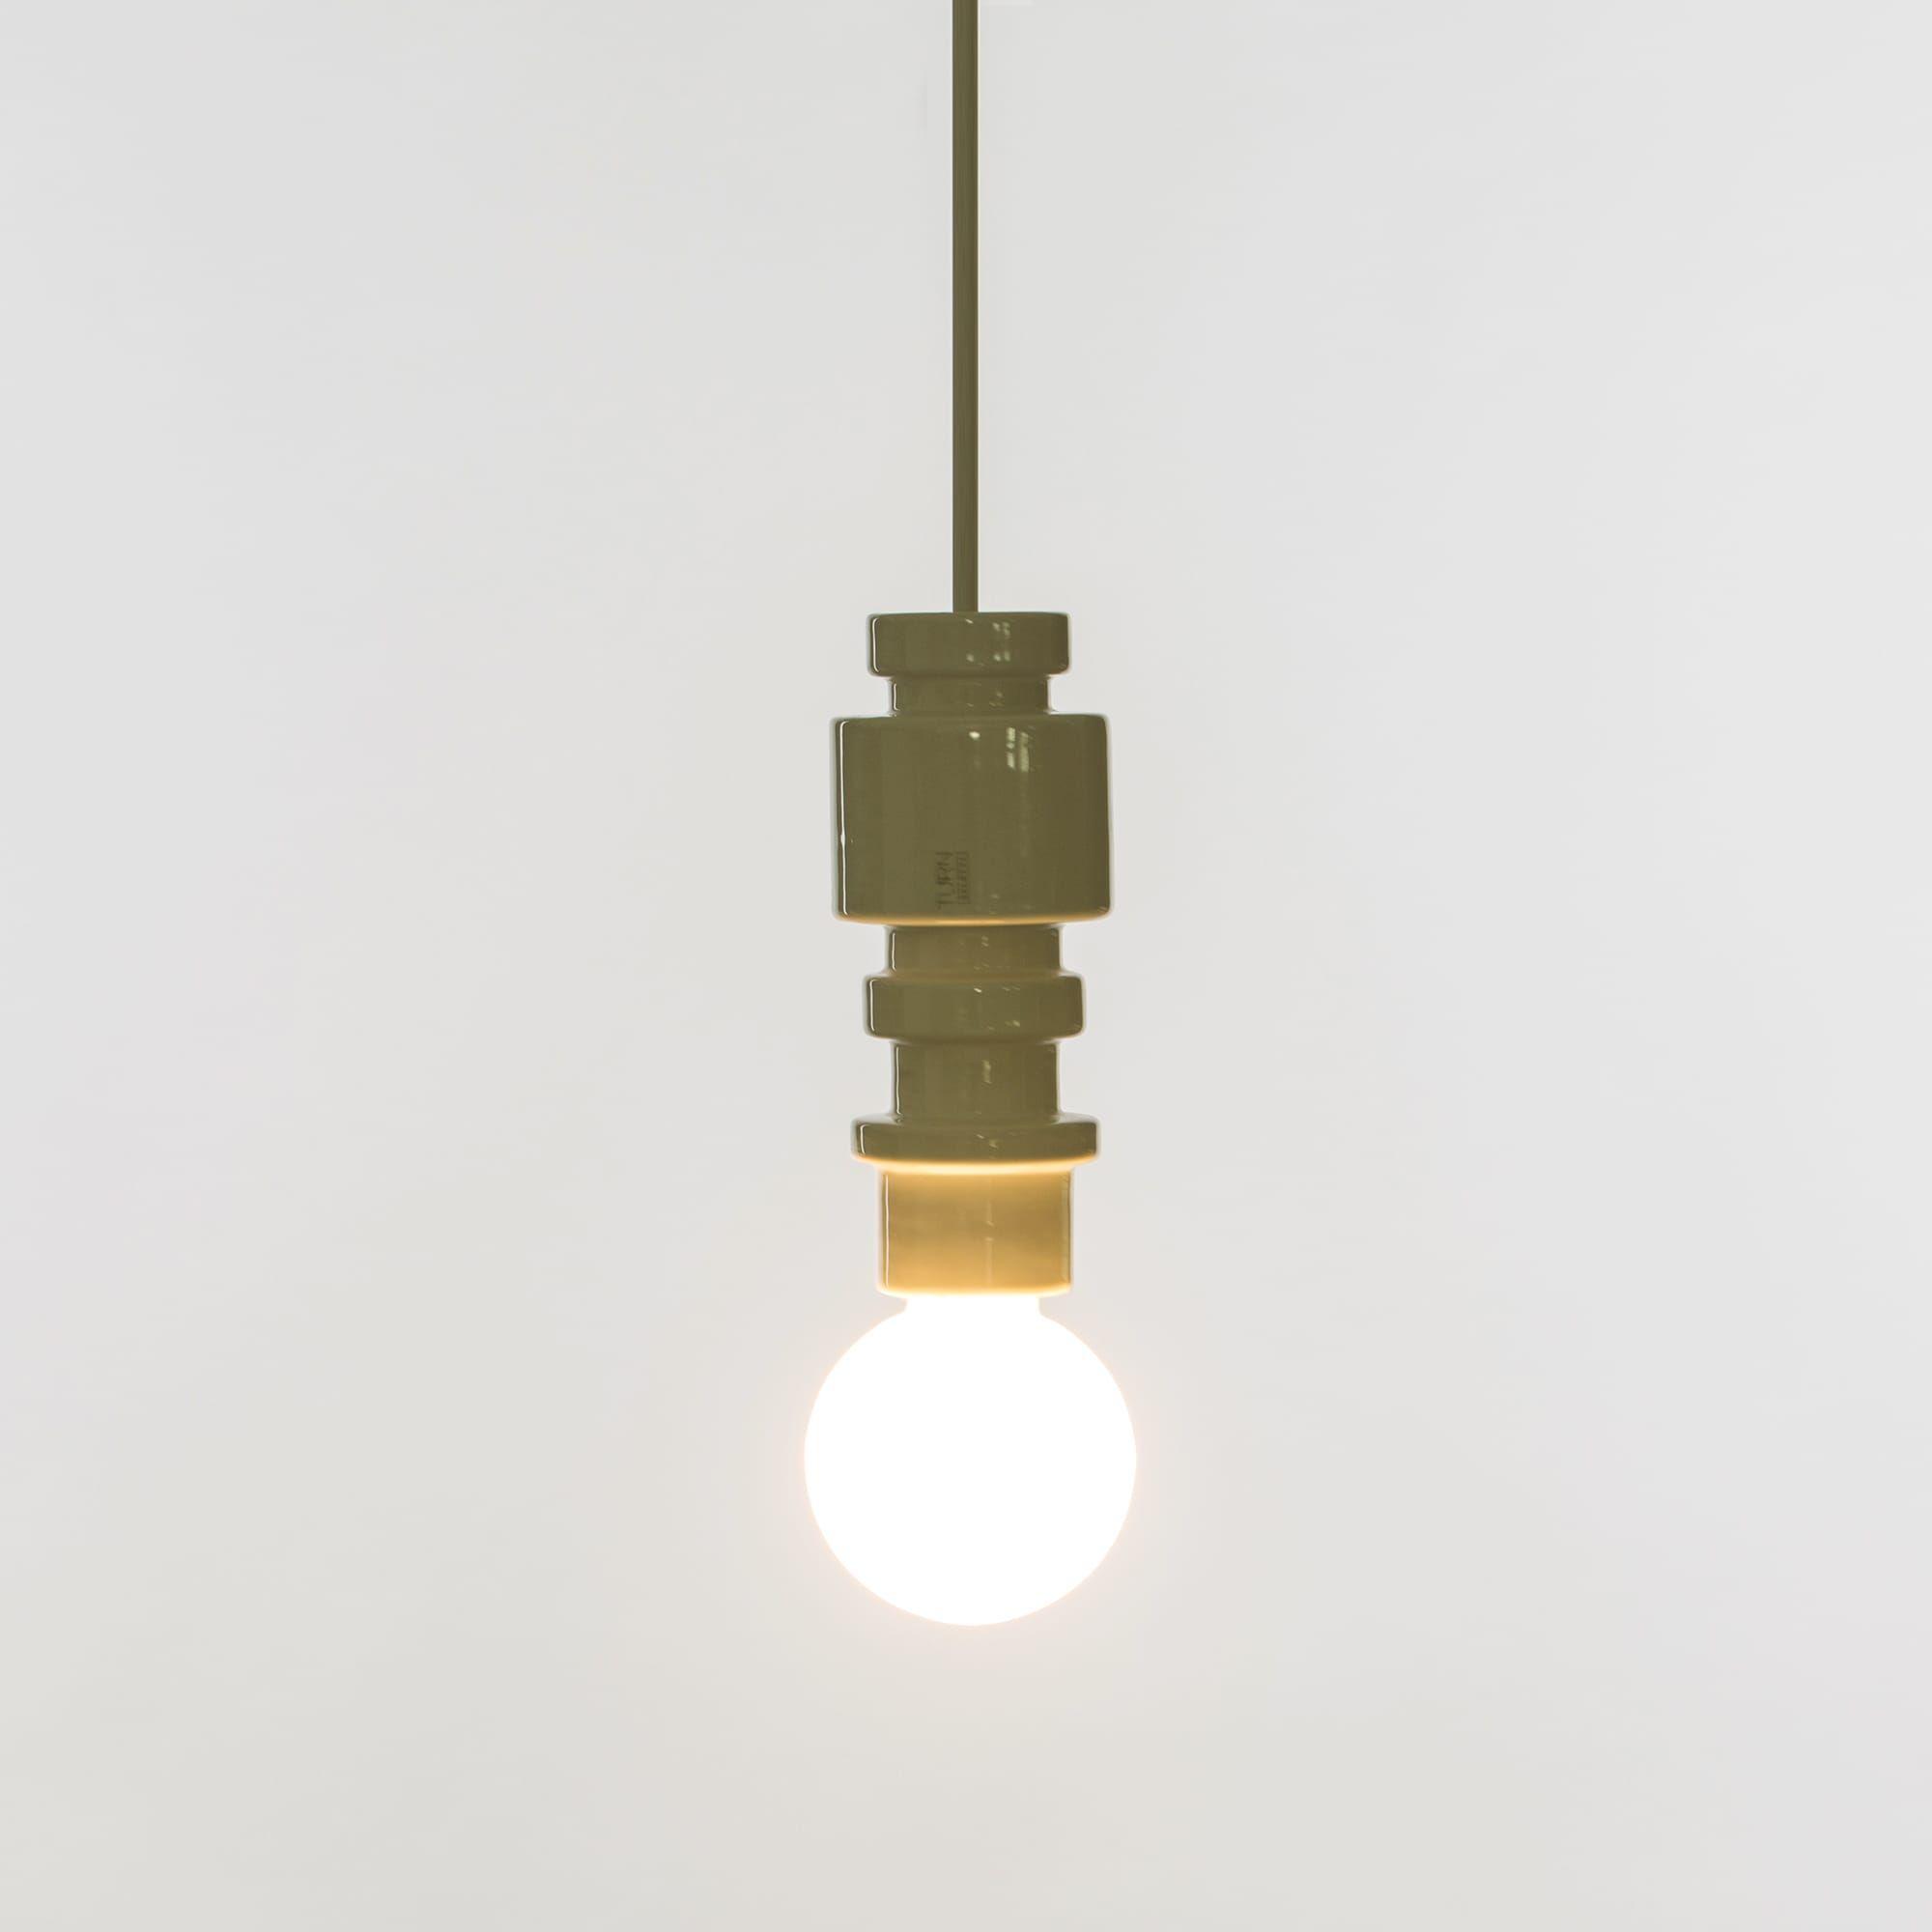 Foyer Kronleuchter Moderne Deckenleuchten Leuchtstofflampen Leuchte Bad Anhanger Beleuchtung Decken Strahler Lampe Ceiling Lamp Lamp Tiffany Table Lamps